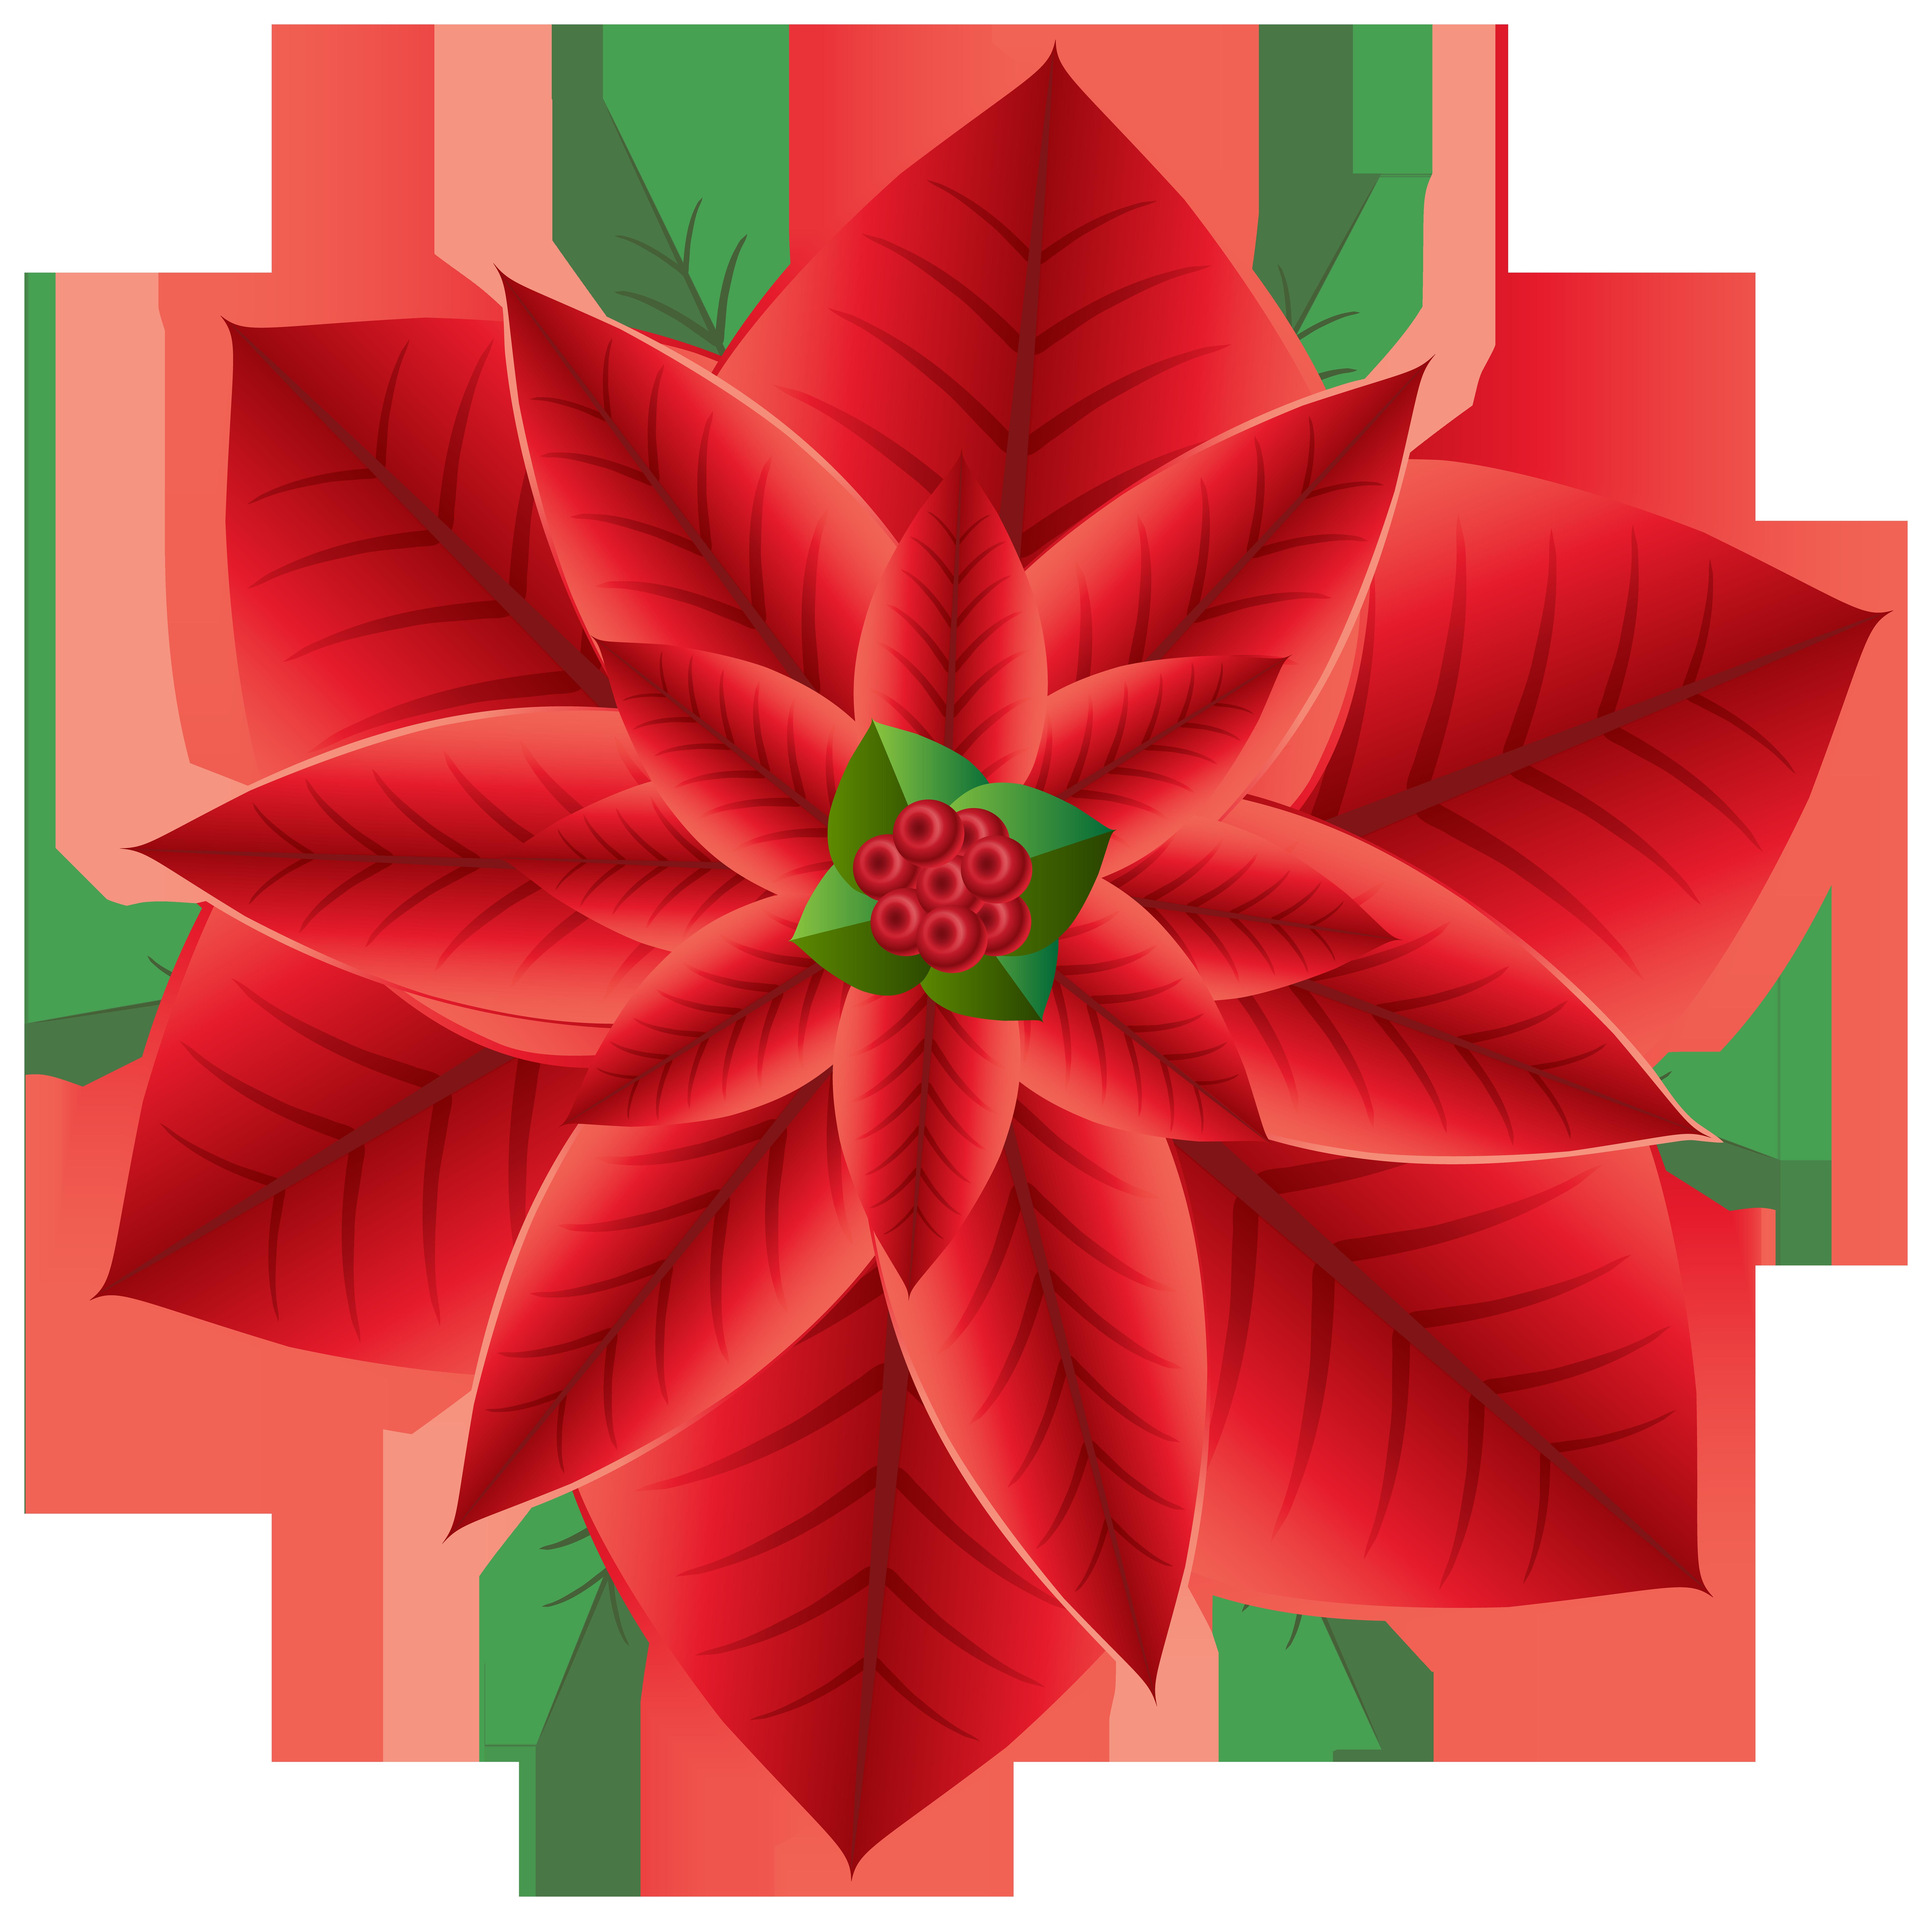 Poinsettia clipart kid. Christmas transparent png clip